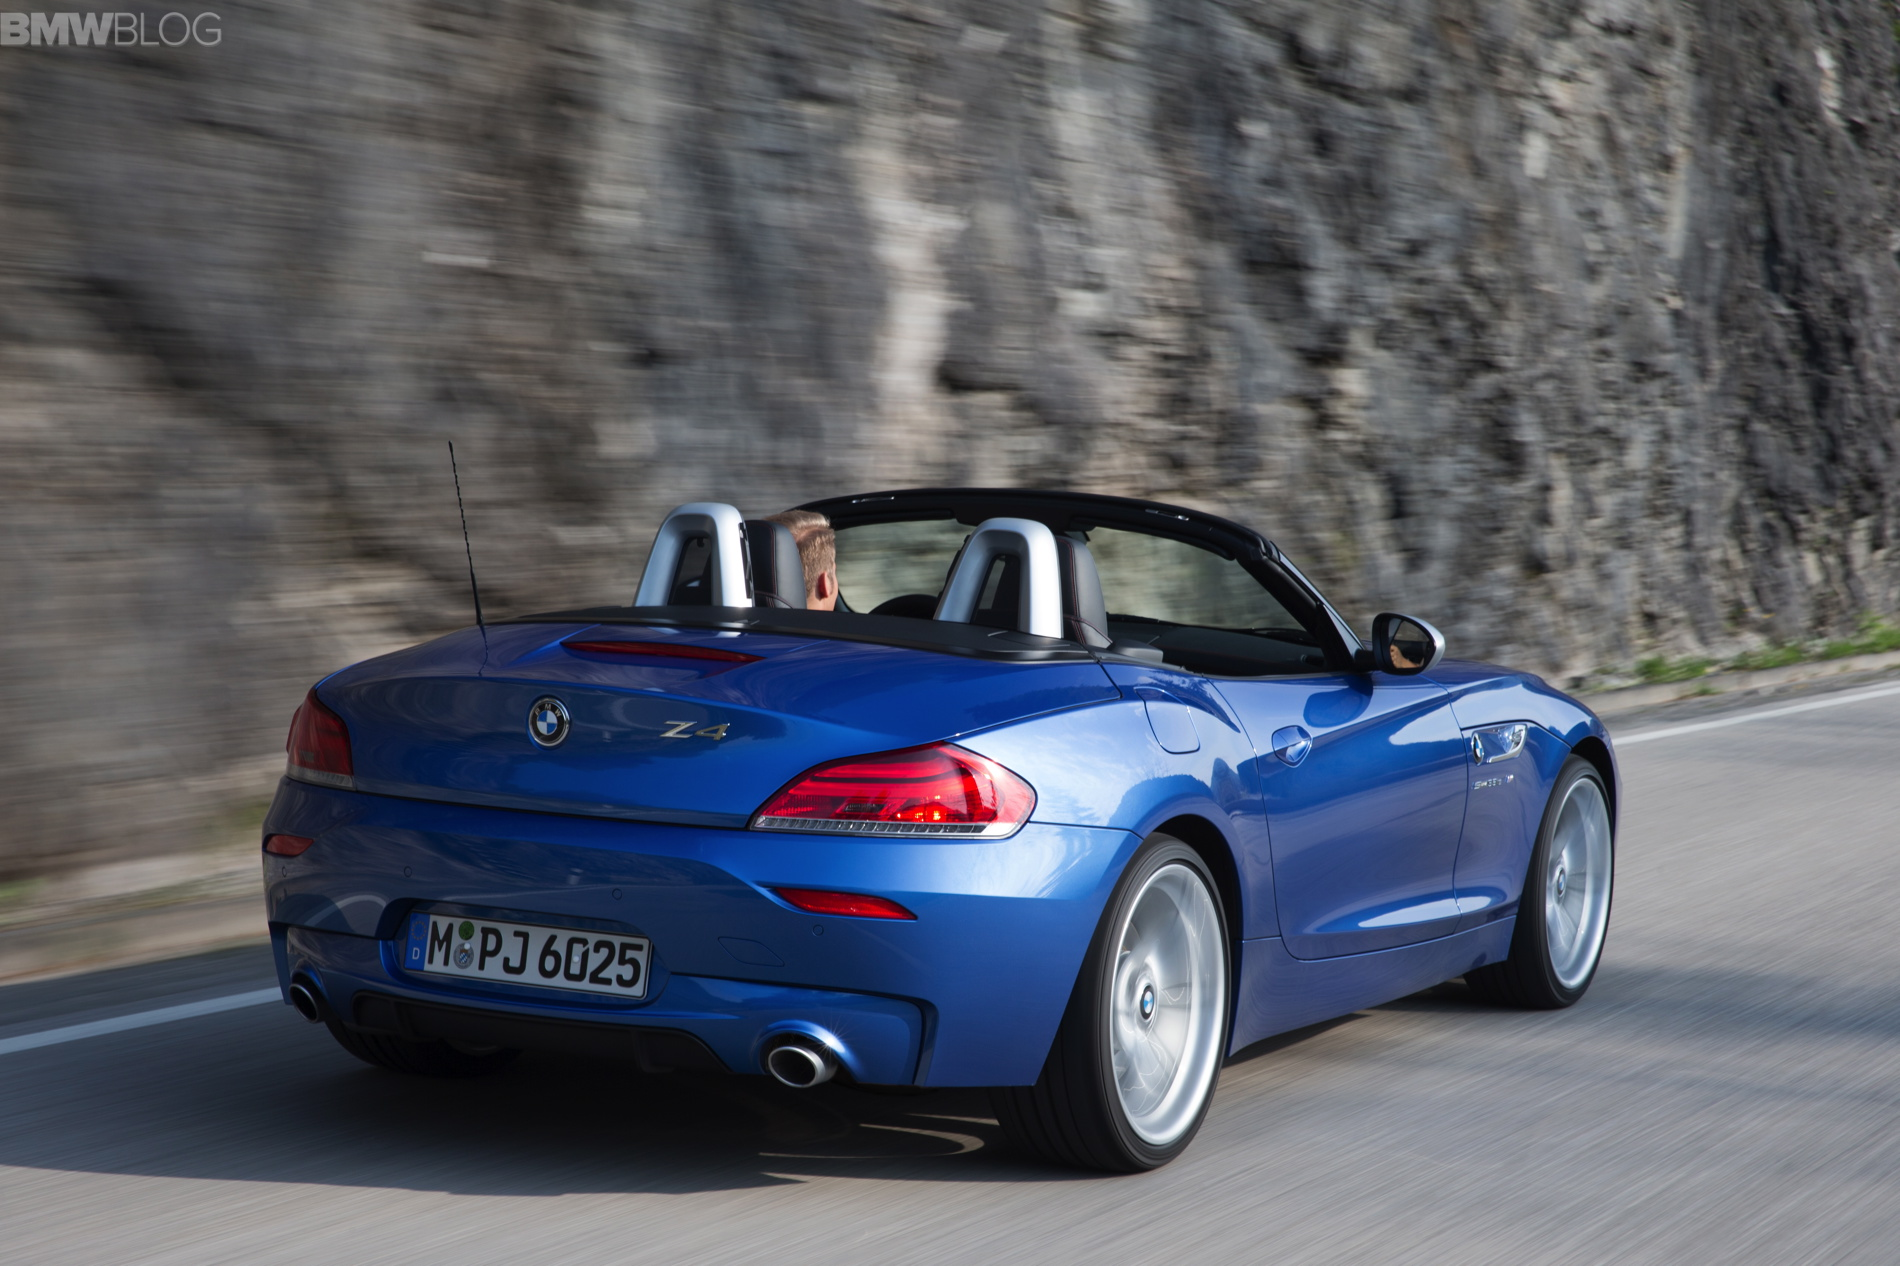 2015 Bmw Z4 Looks Great In Estoril Blue